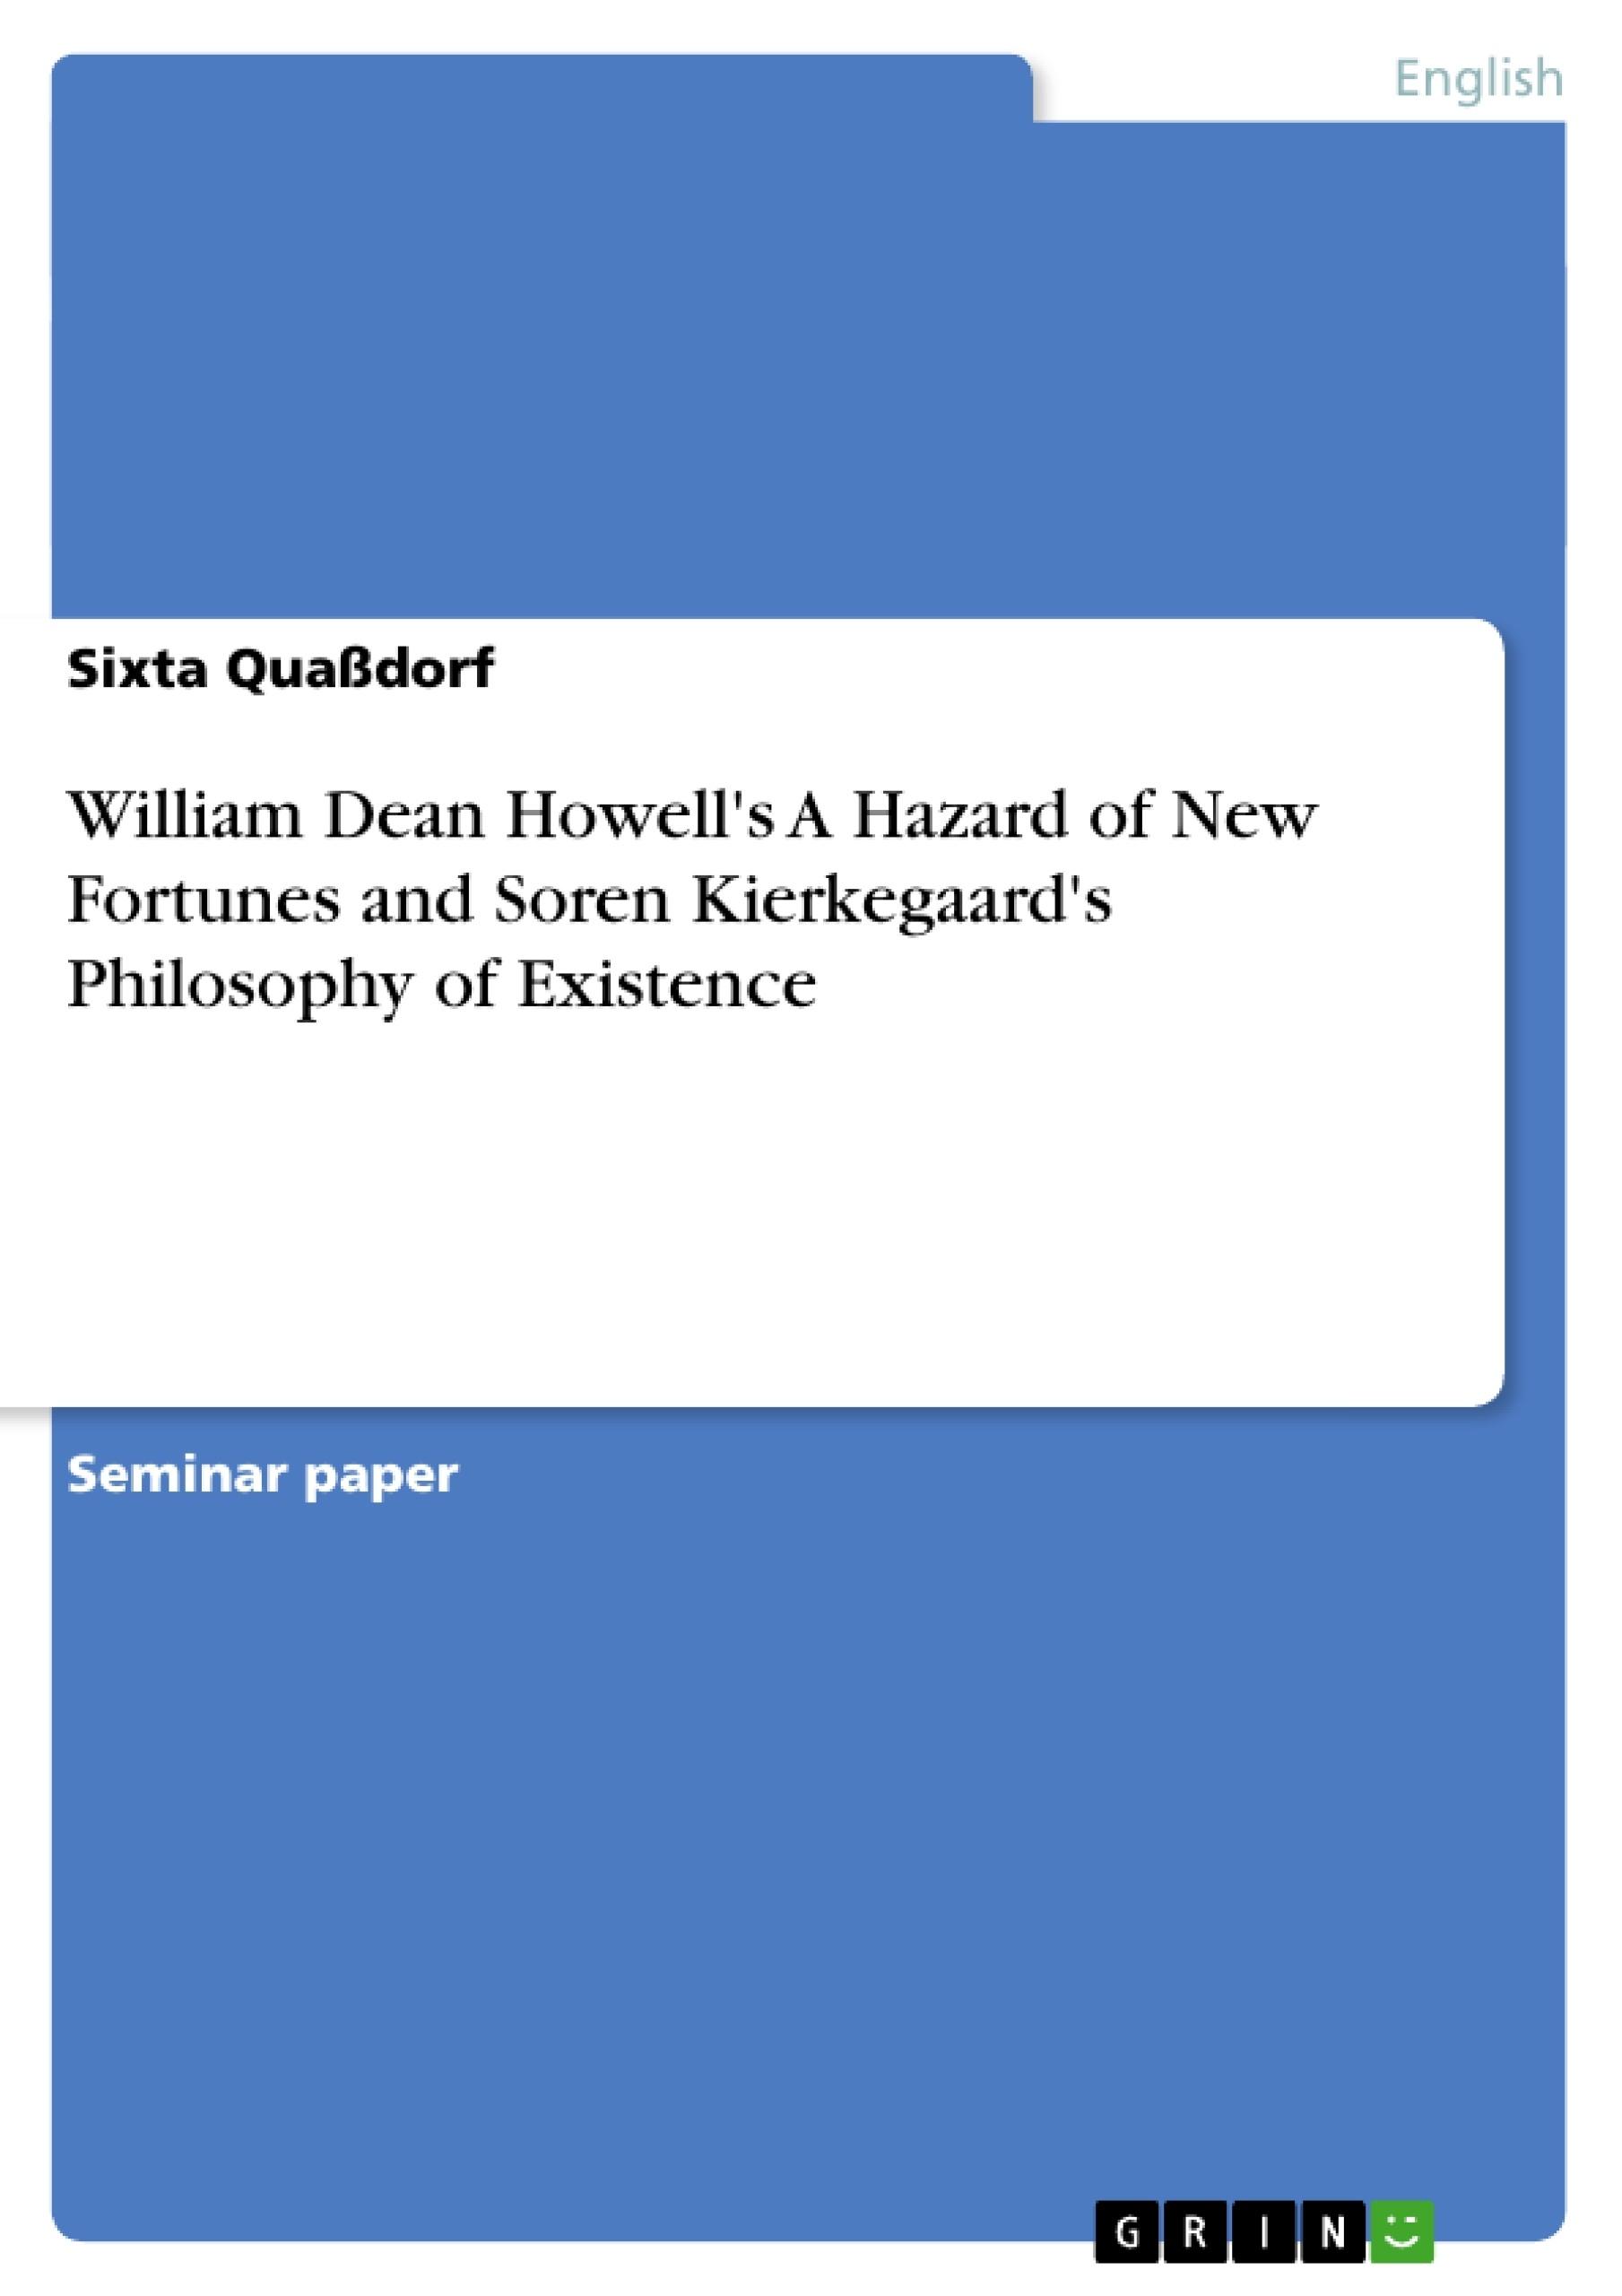 Title: William Dean Howell's A Hazard of New Fortunes and Soren Kierkegaard's Philosophy of Existence